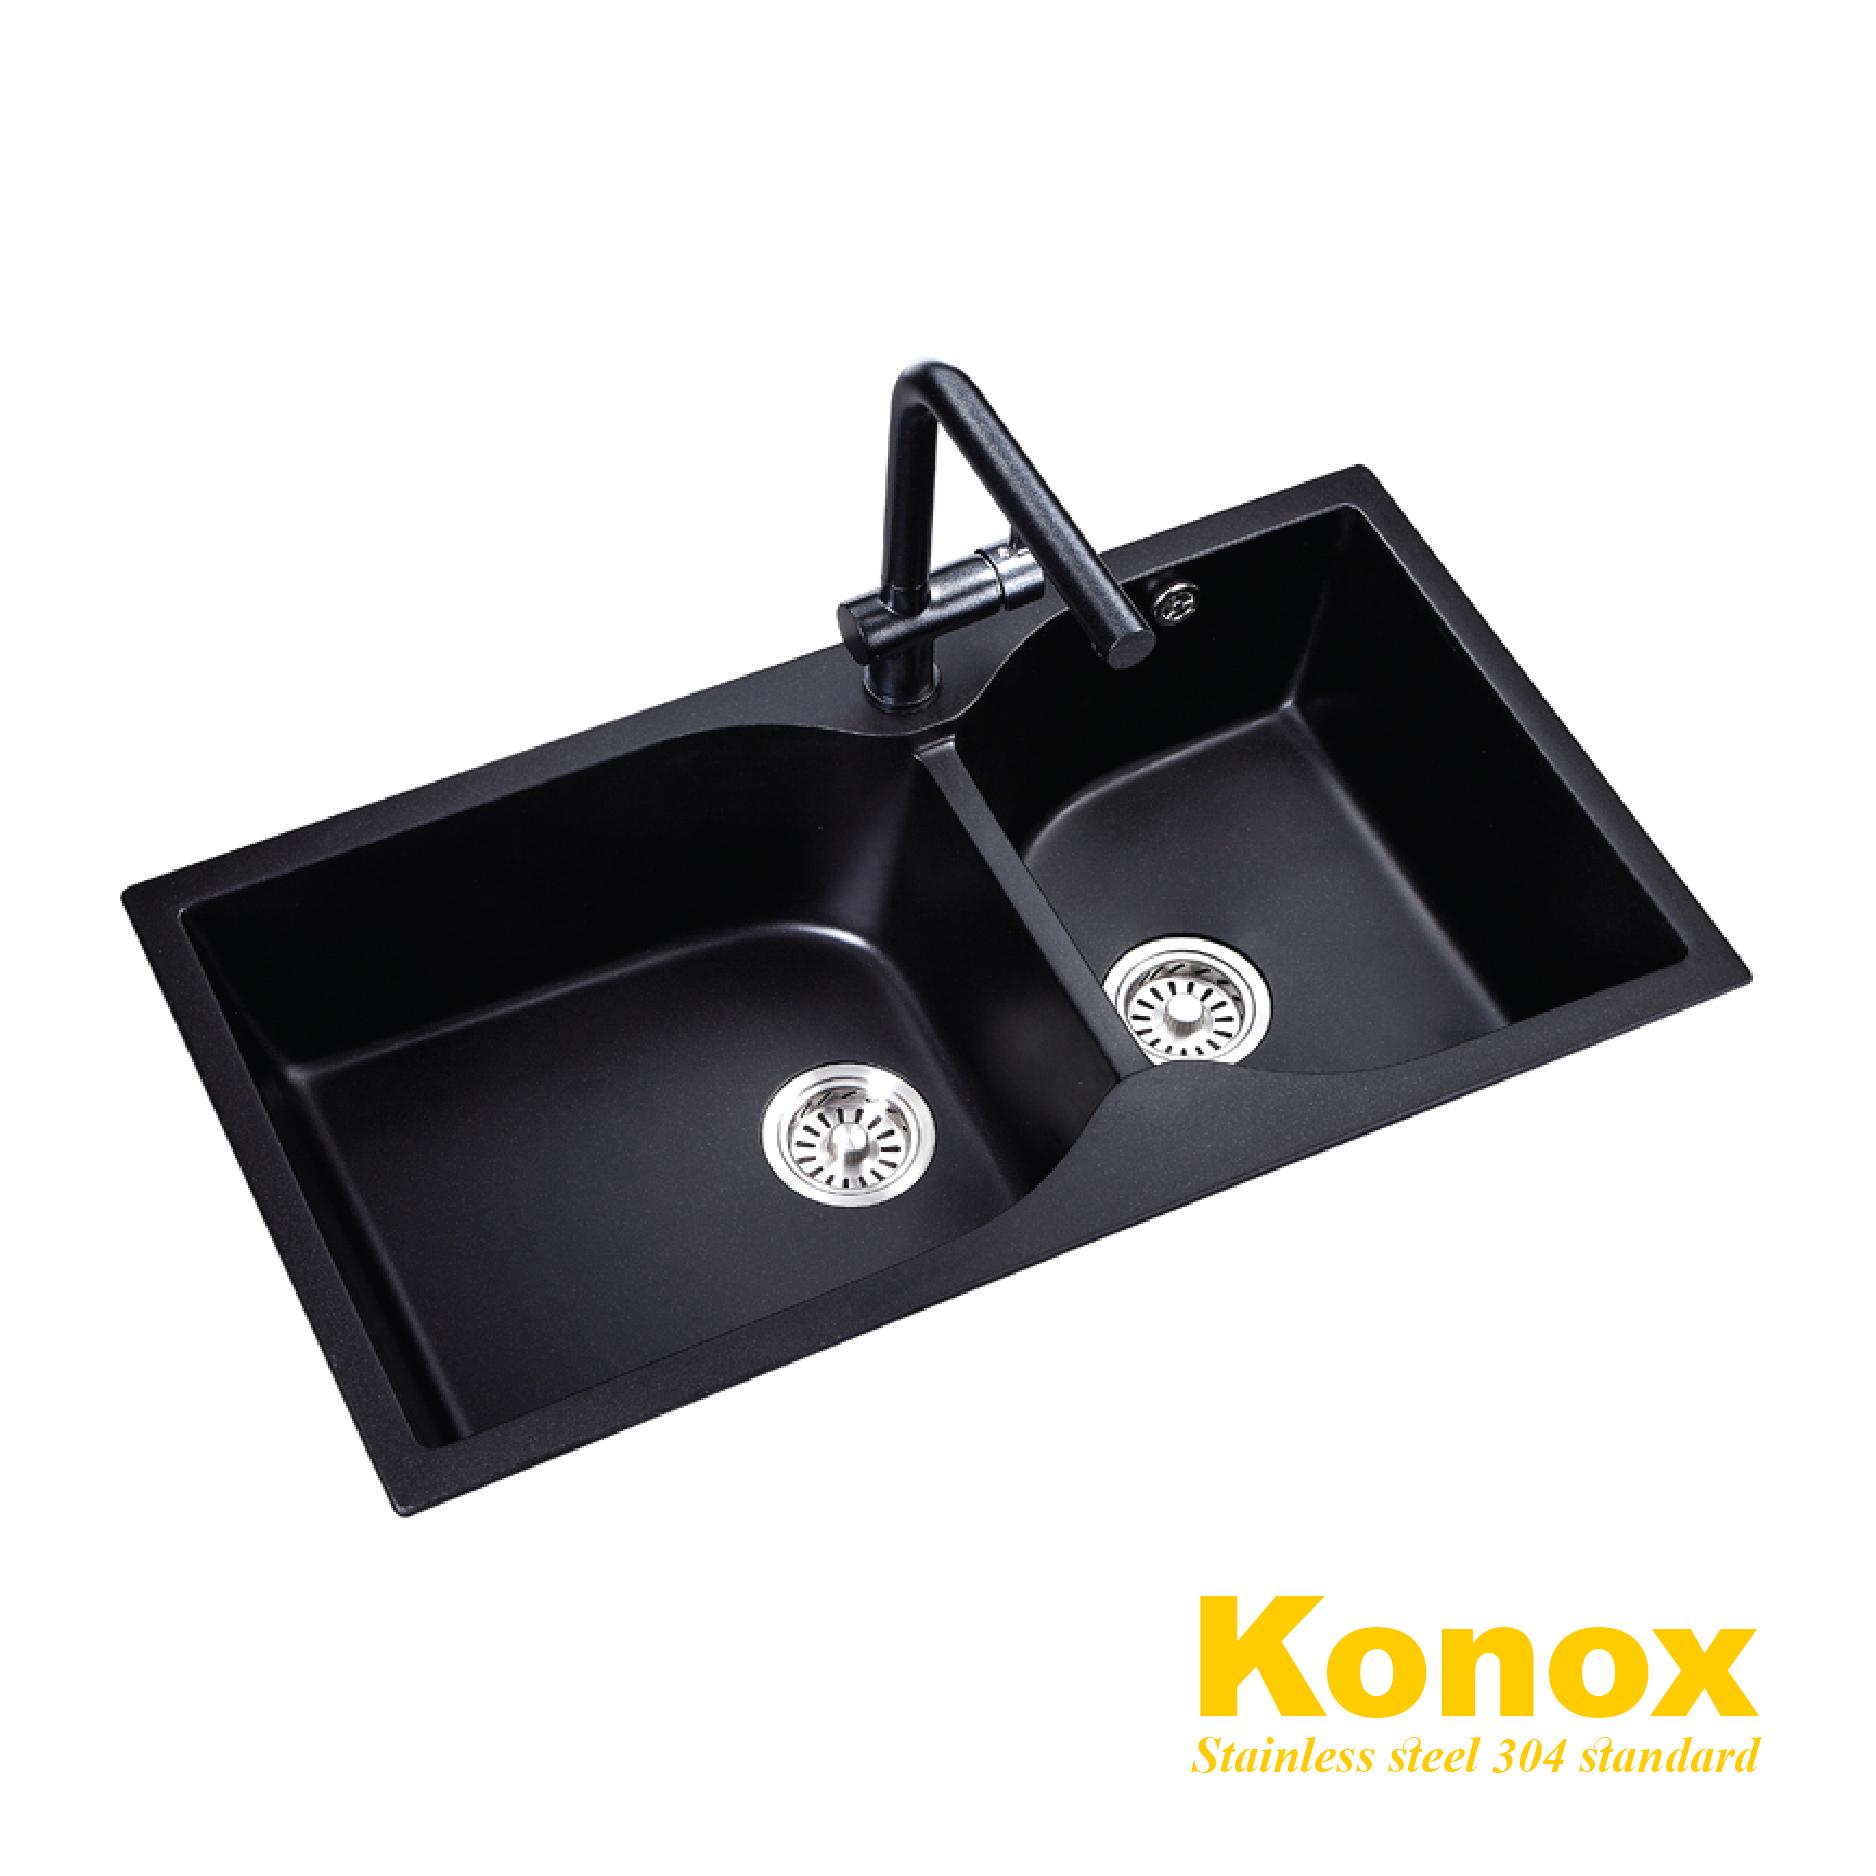 Chậu rửa bát đá Granite Konox KN8848G-B